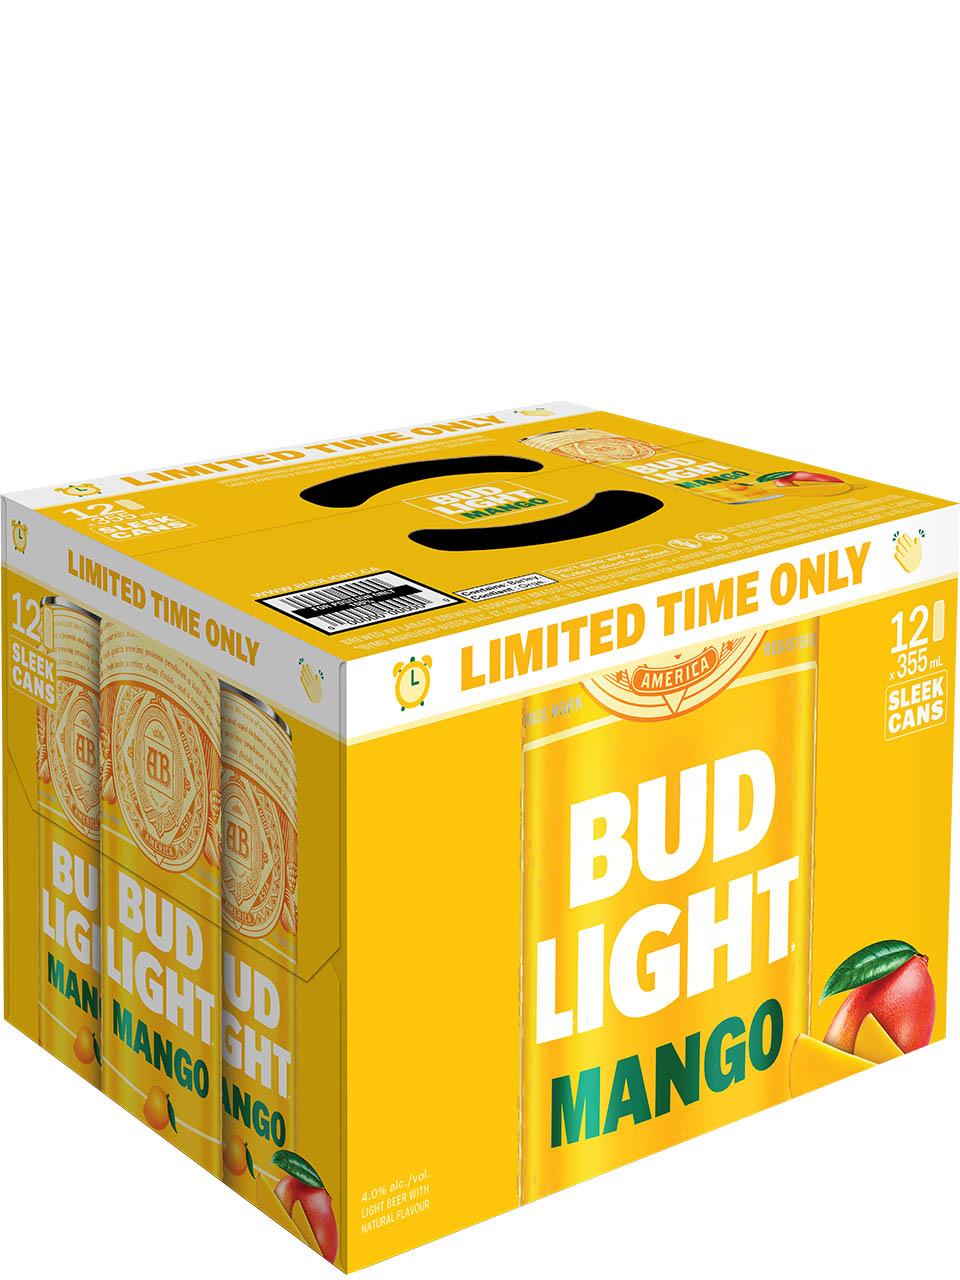 Bud Light Mango 12 Pack Cans